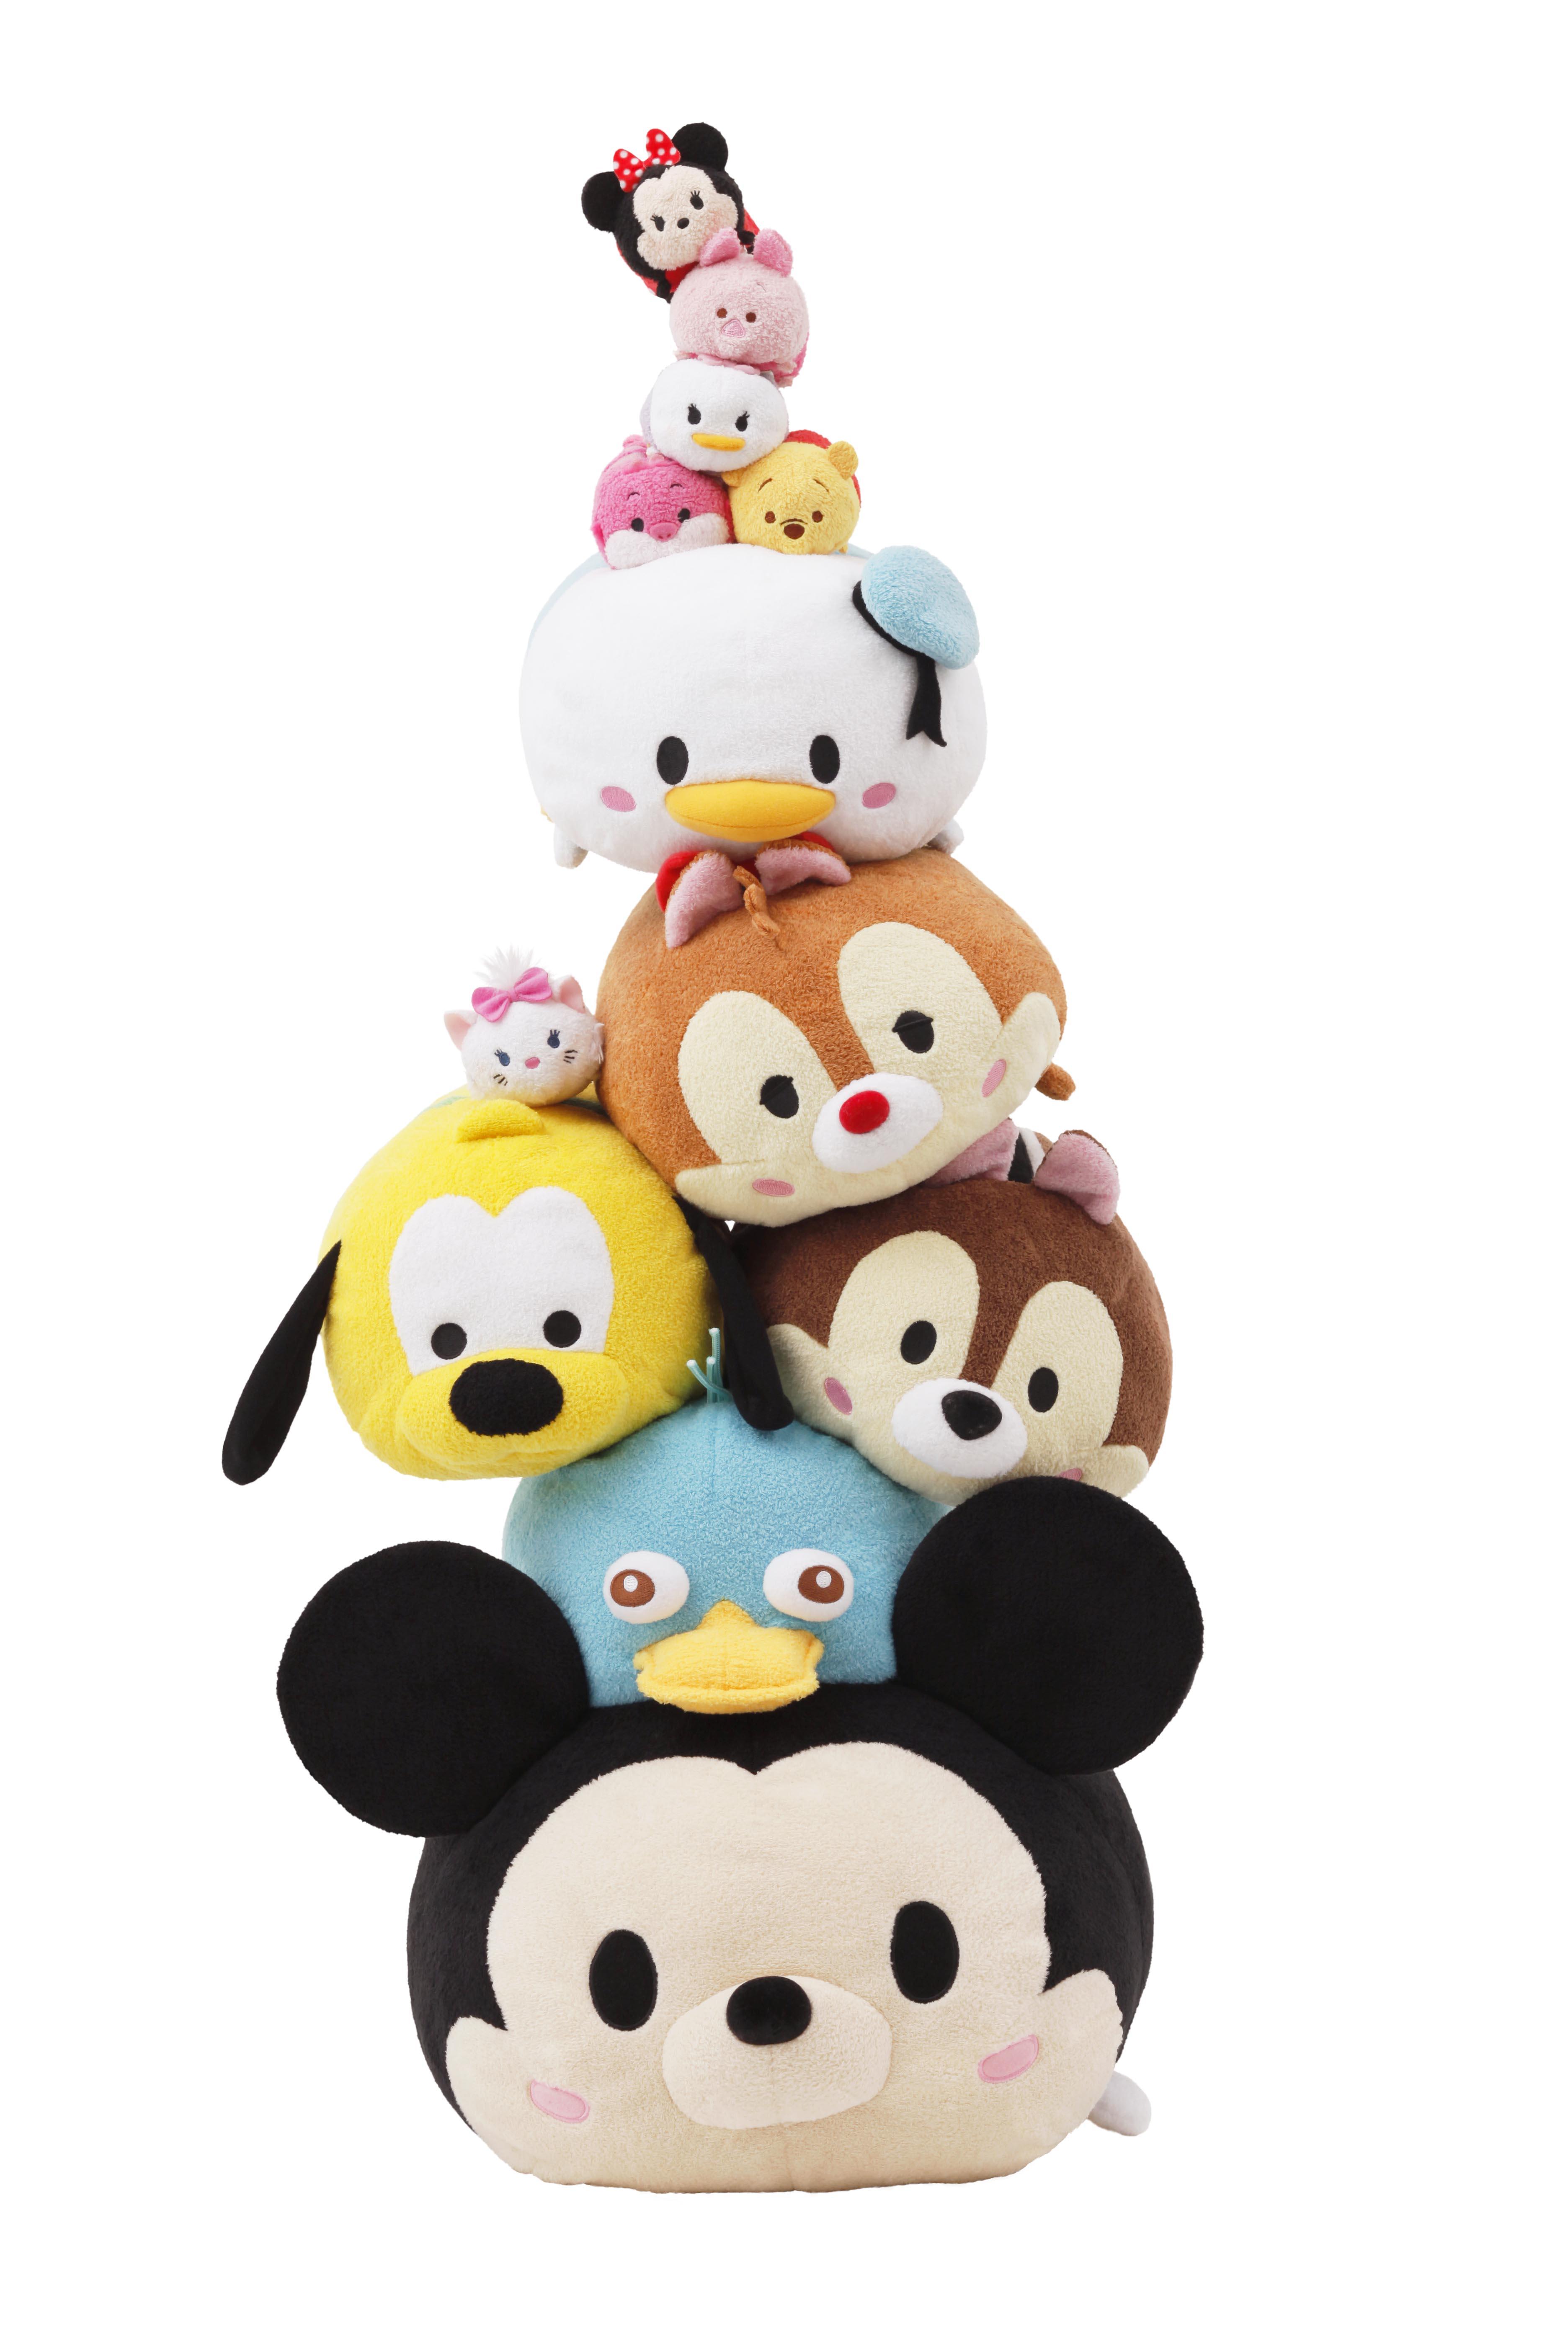 Tsum Tsumシリーズ 販売累計200万個 Line ディズニー ツムツム